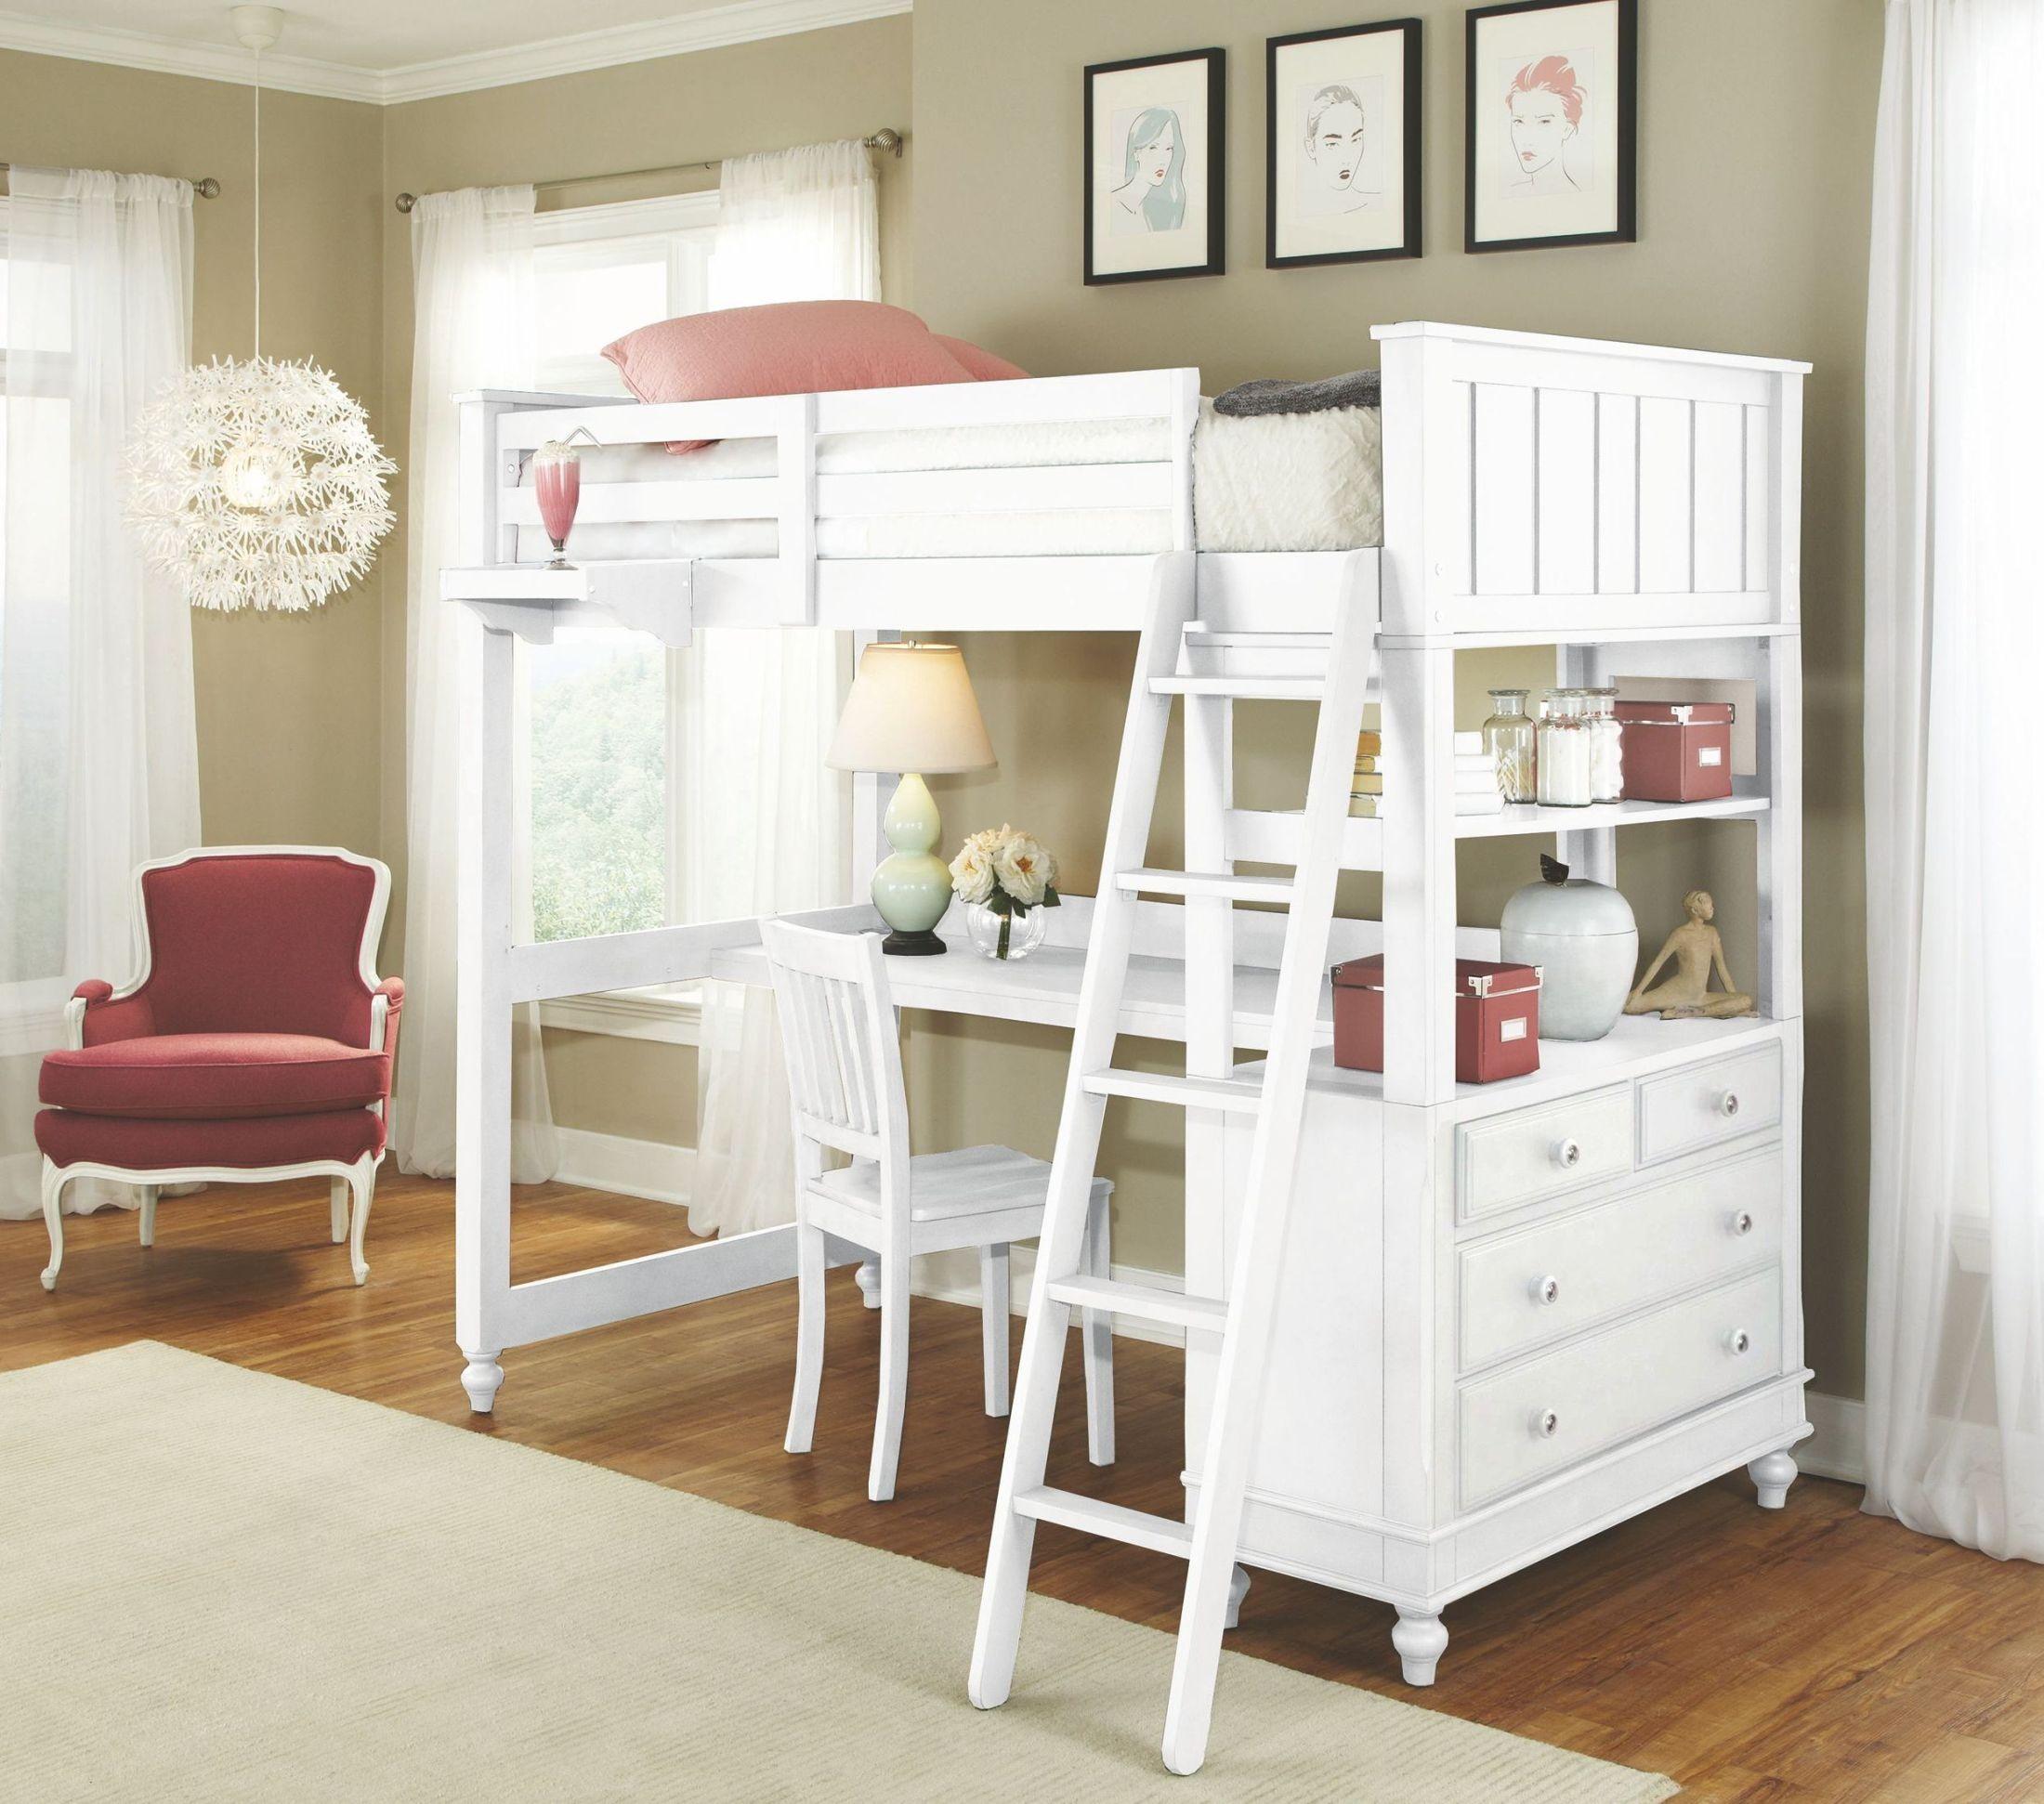 Lake House White Twin Loft Bed With Desk, 1040ND, NE Kids